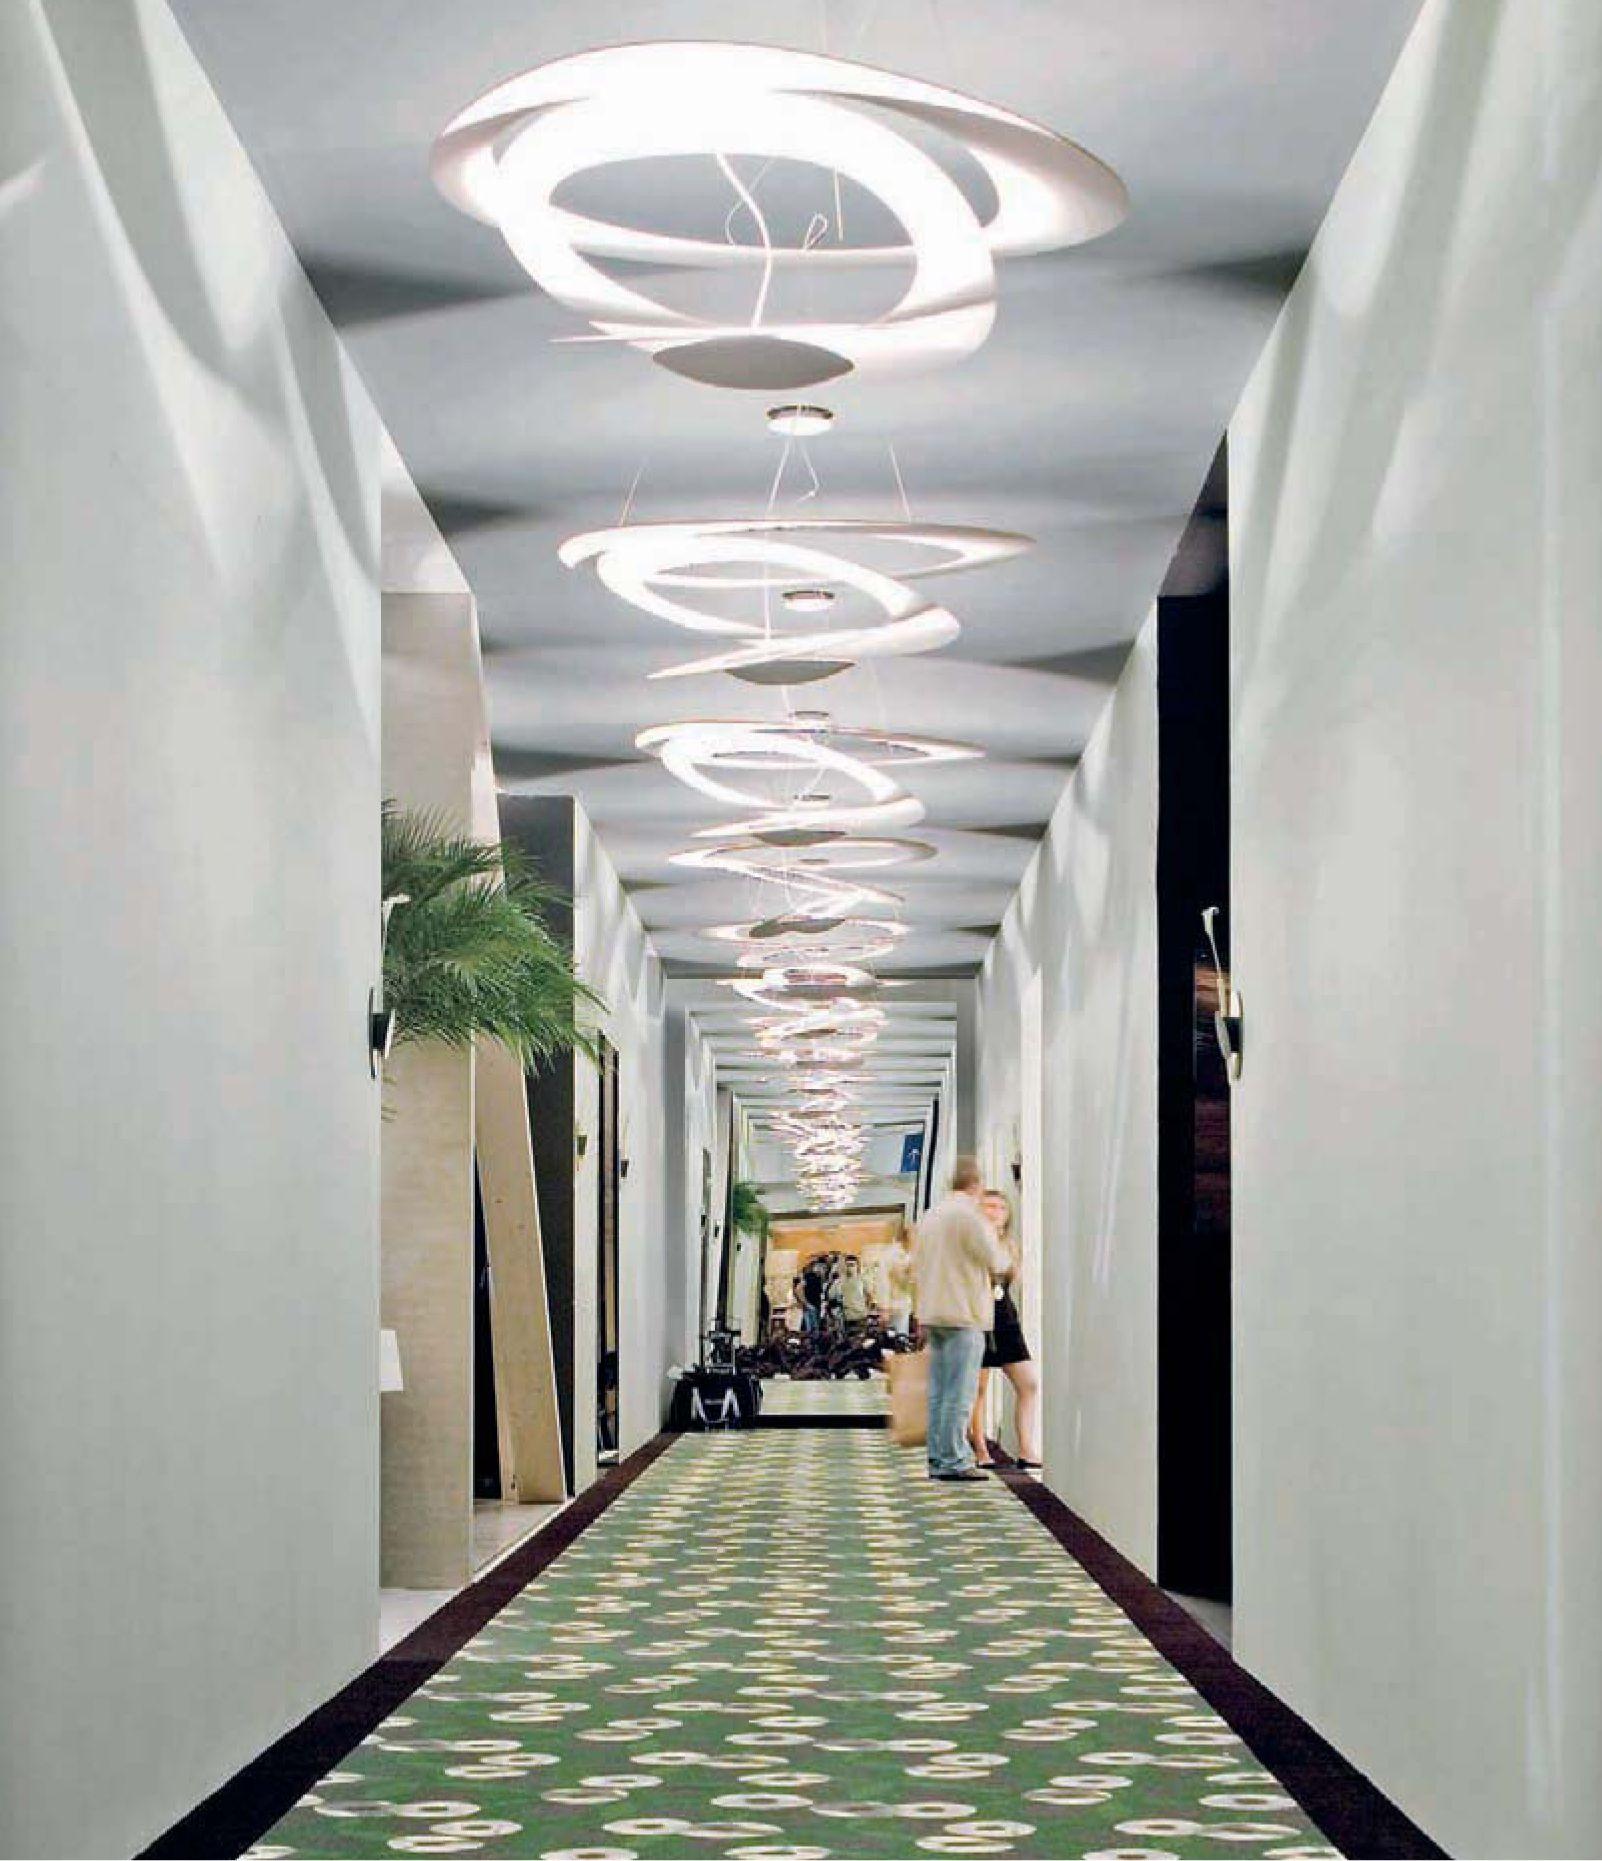 artemide pirce ceiling lights - Artemide Lighting